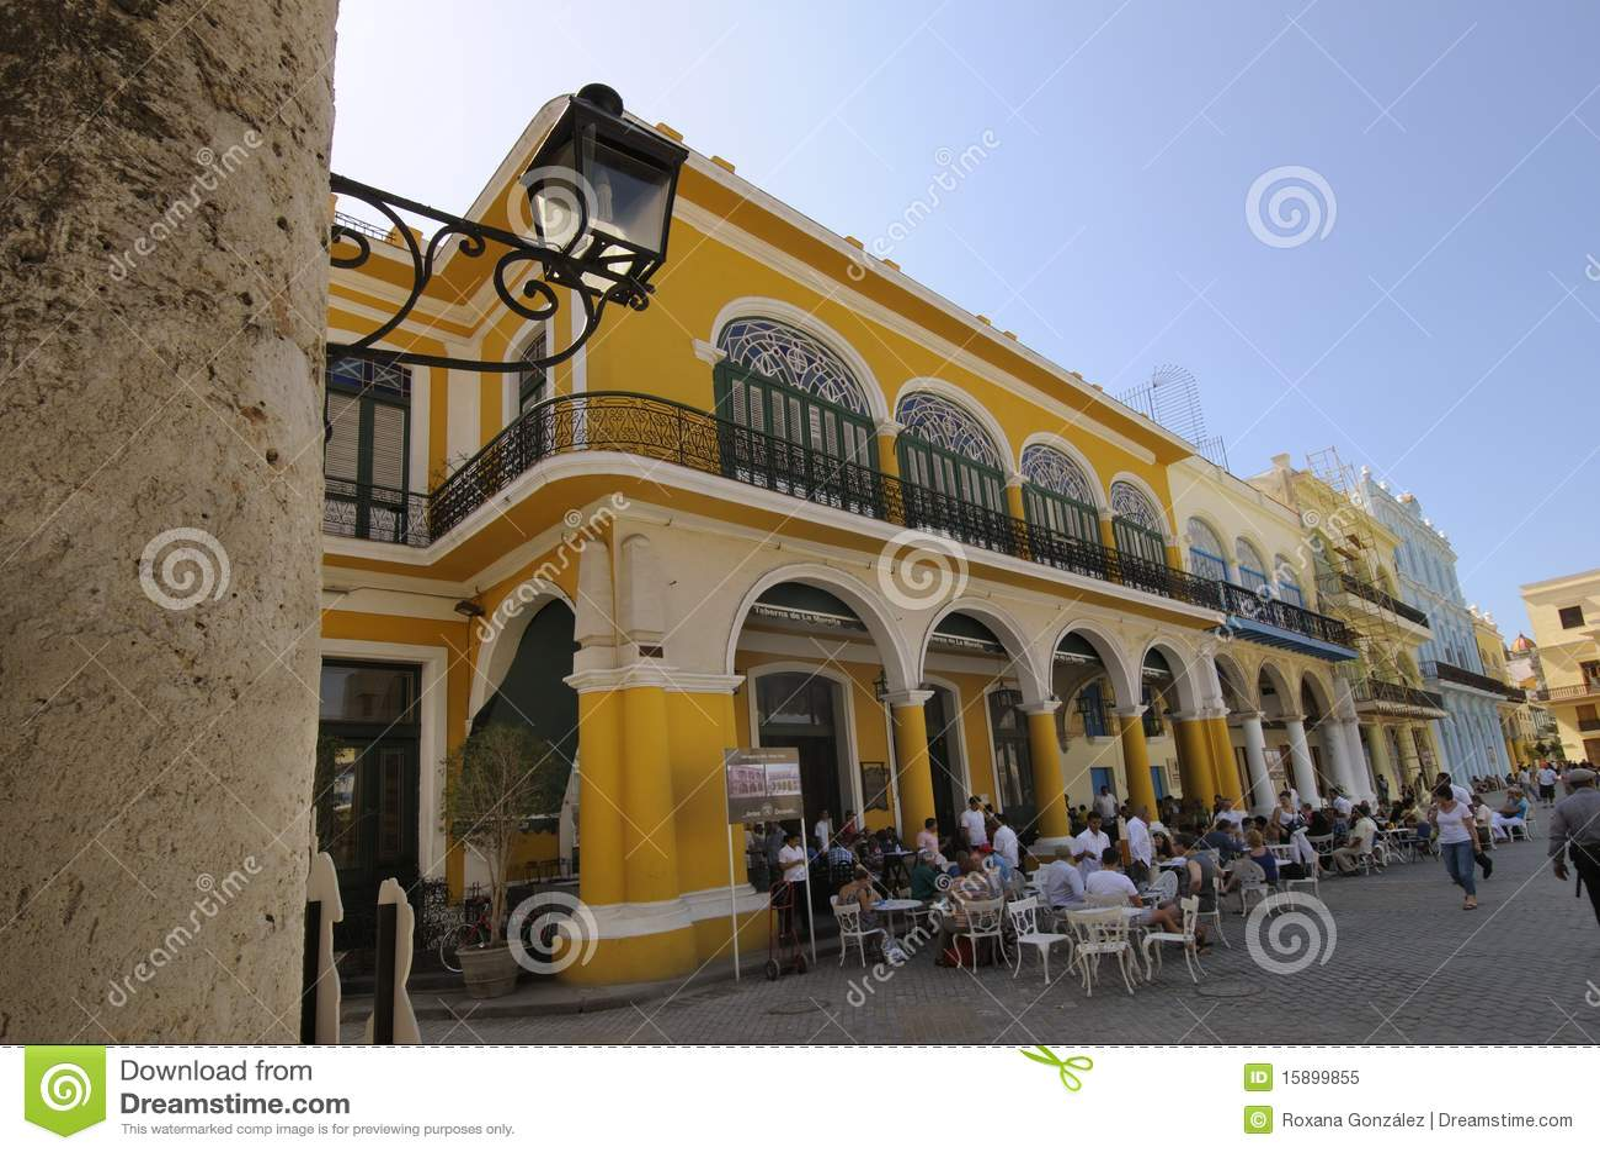 Vieille brasserie de La Havane dans la plaza Vieja. 6 avril 2010.